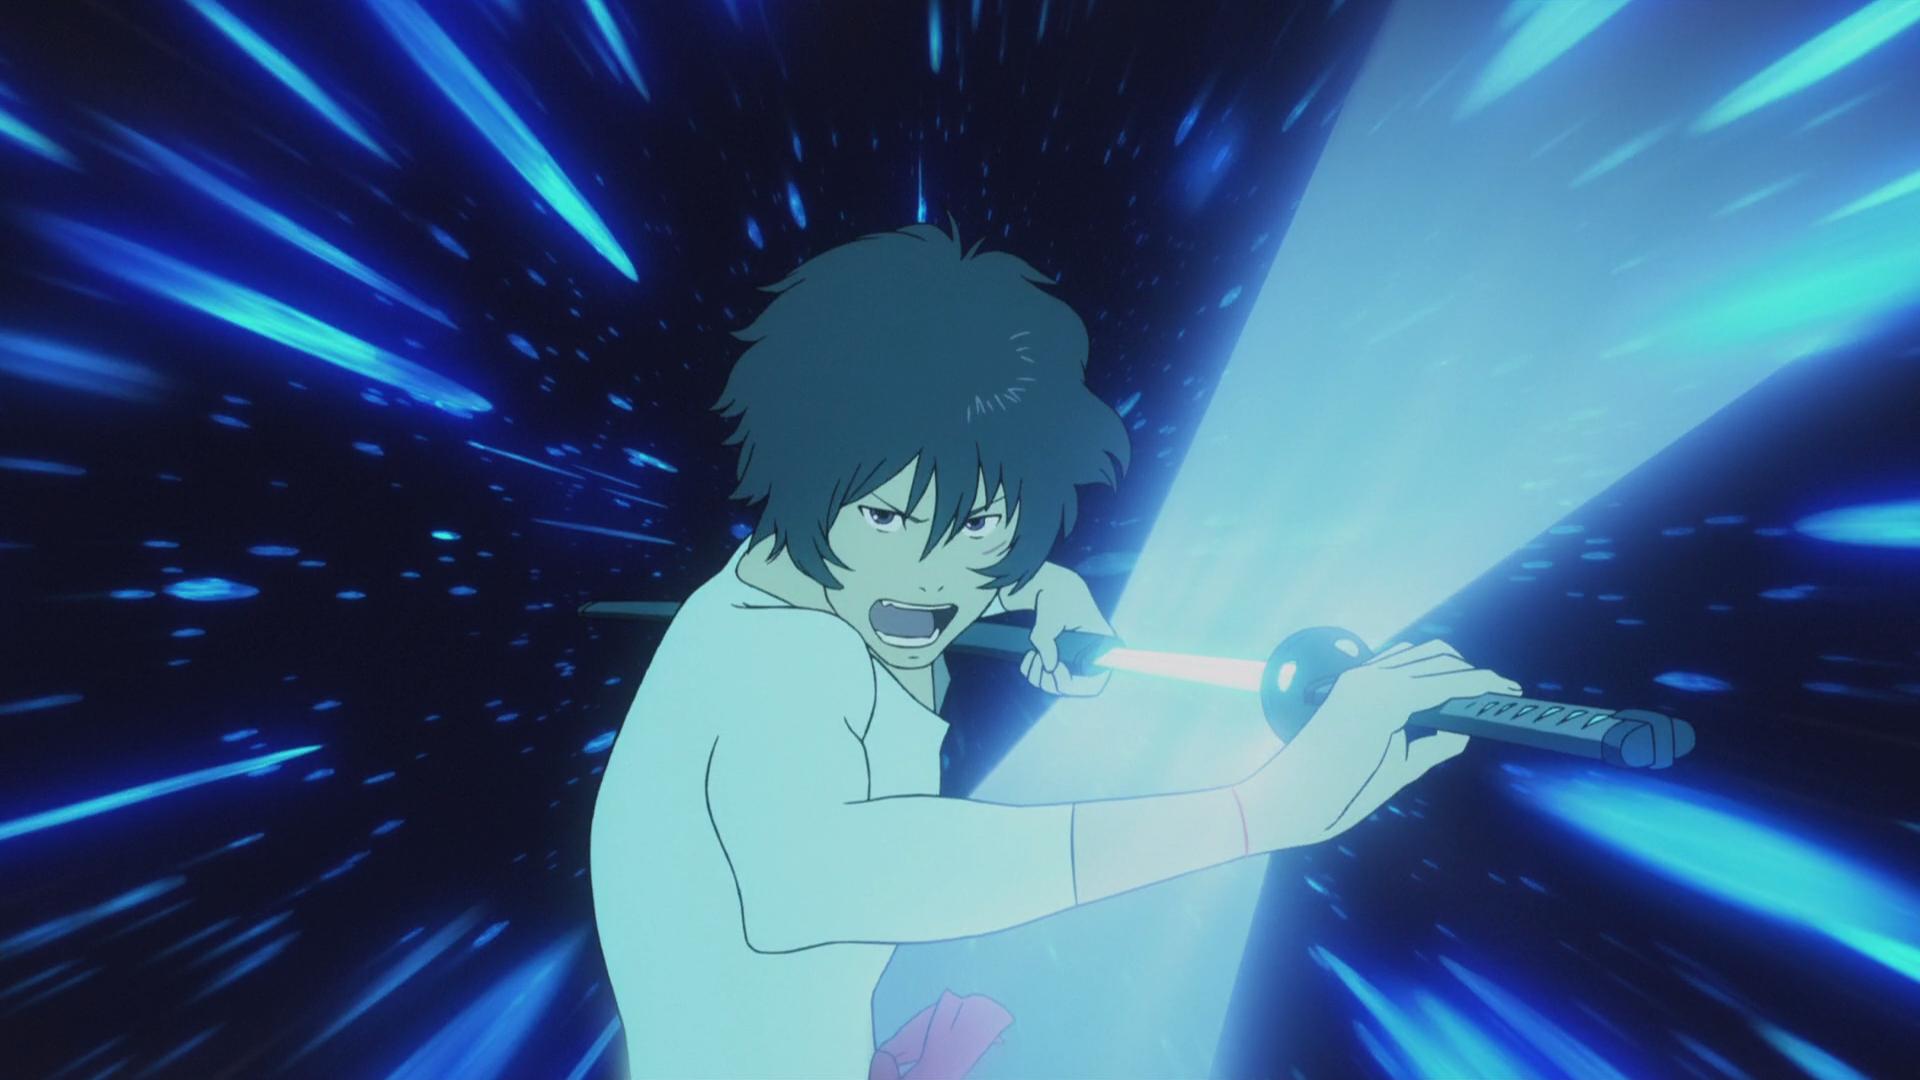 Anime The Boy And The Beast Bakemono No Ko Sword Wallpaper